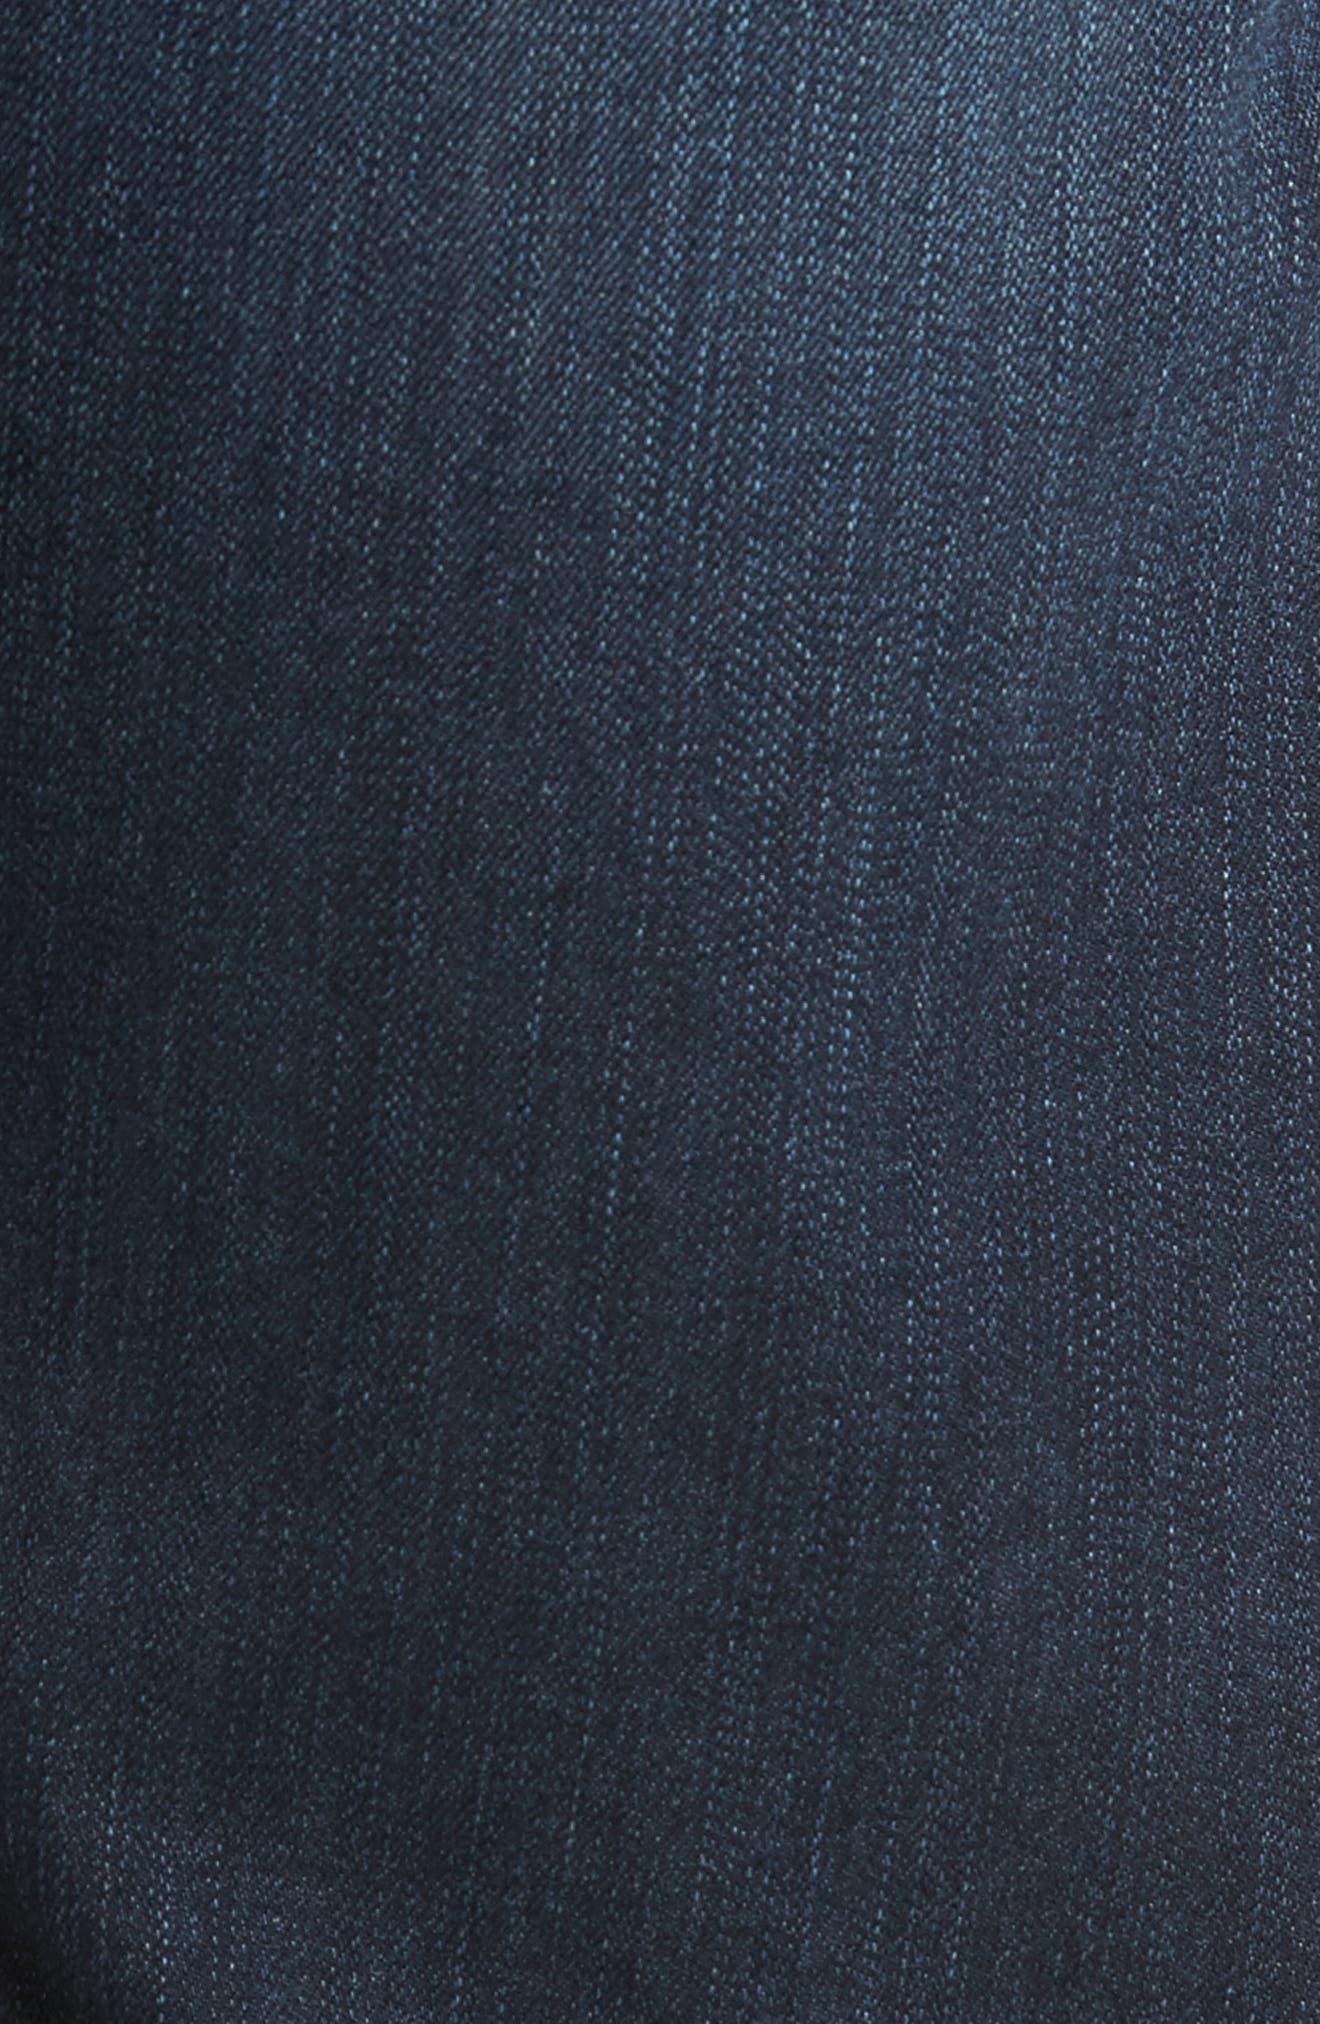 Blake Slim Fit Jeans,                             Alternate thumbnail 5, color,                             400